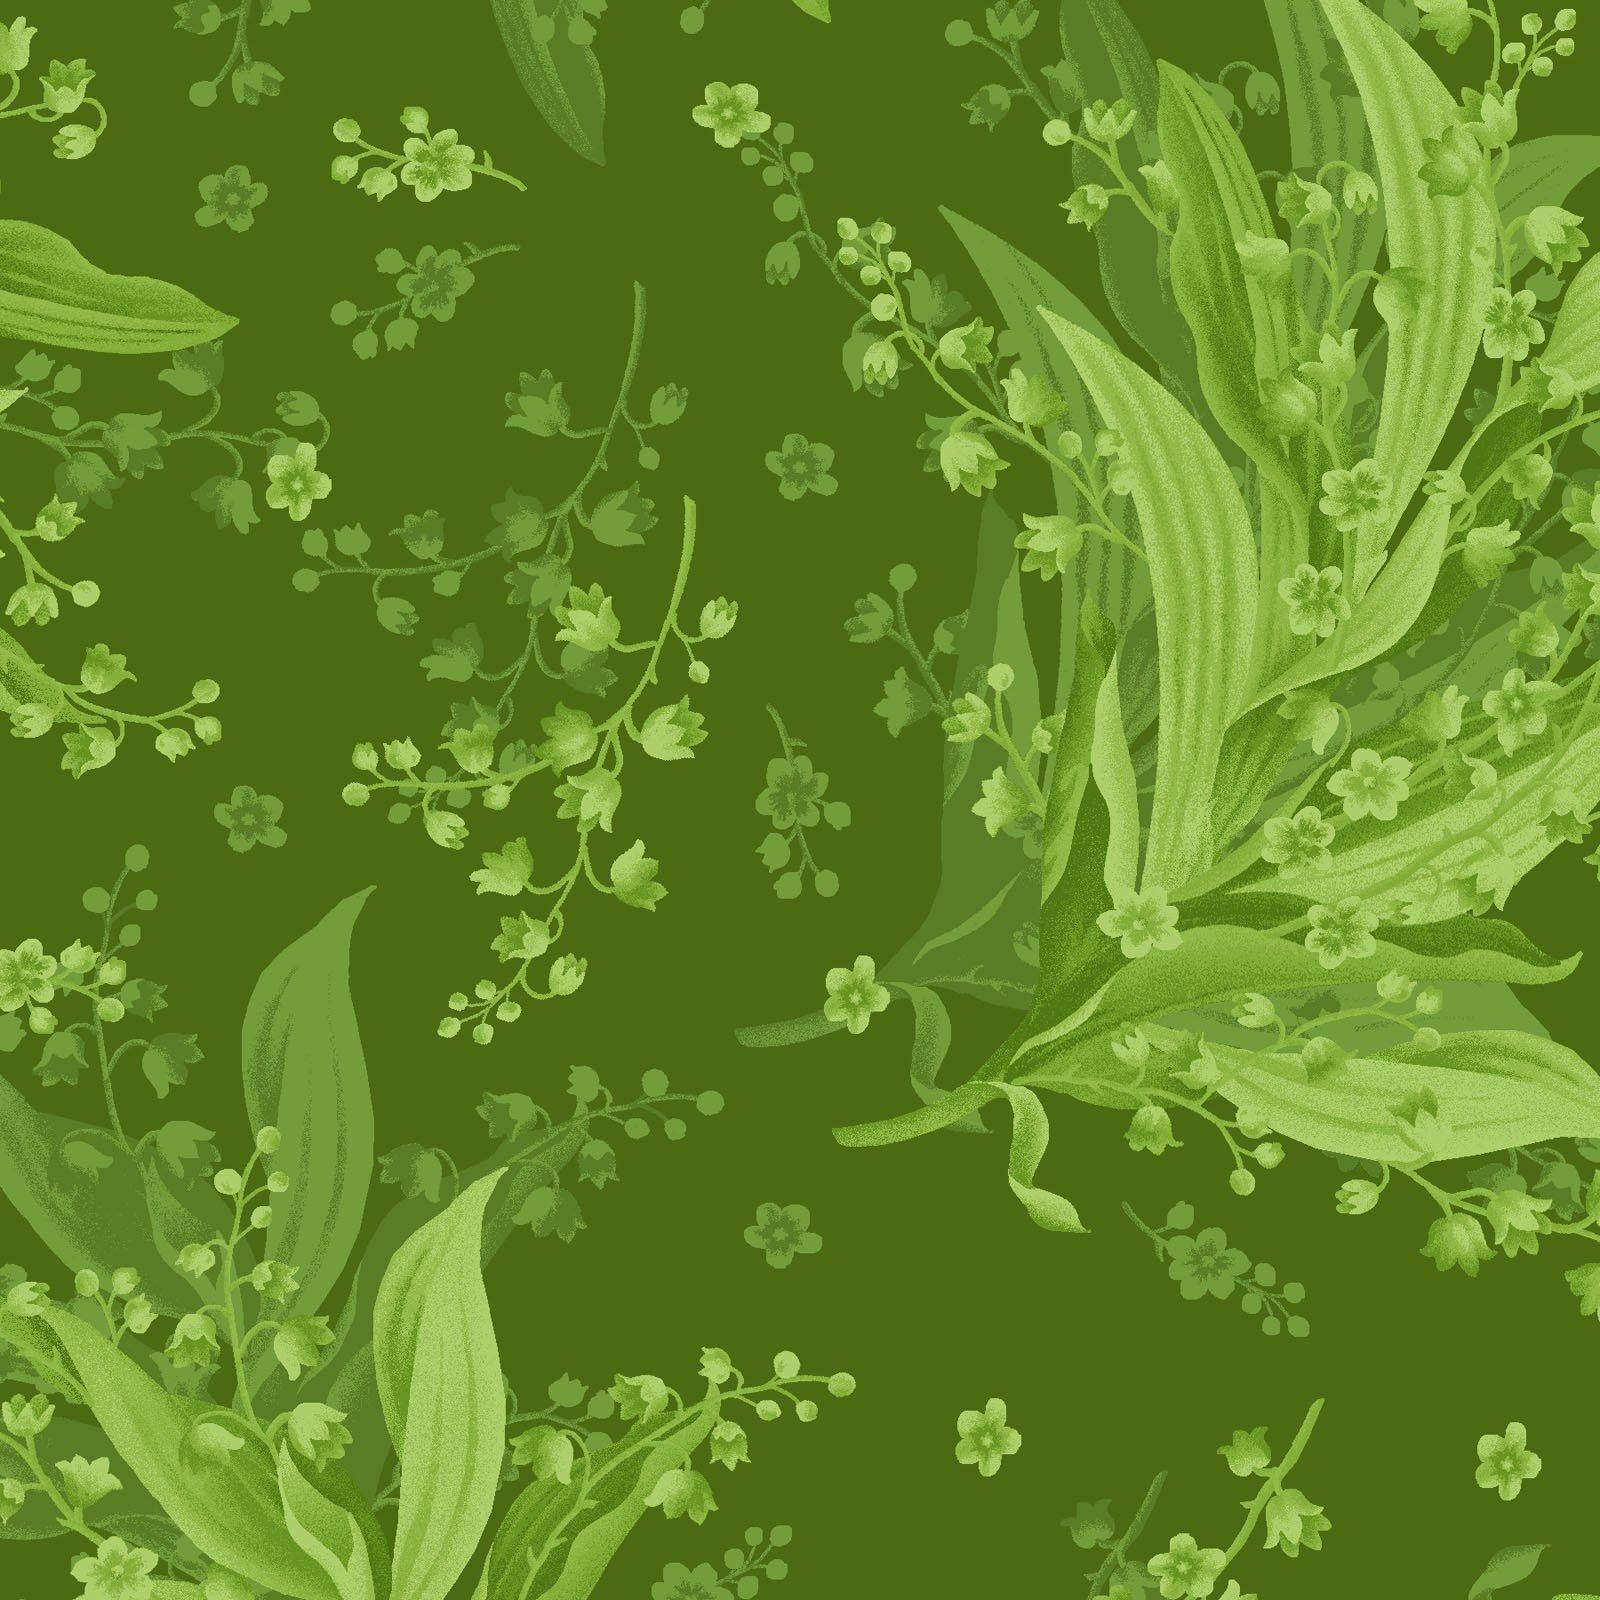 Maywood Studios - Greenery - Tonal Lily